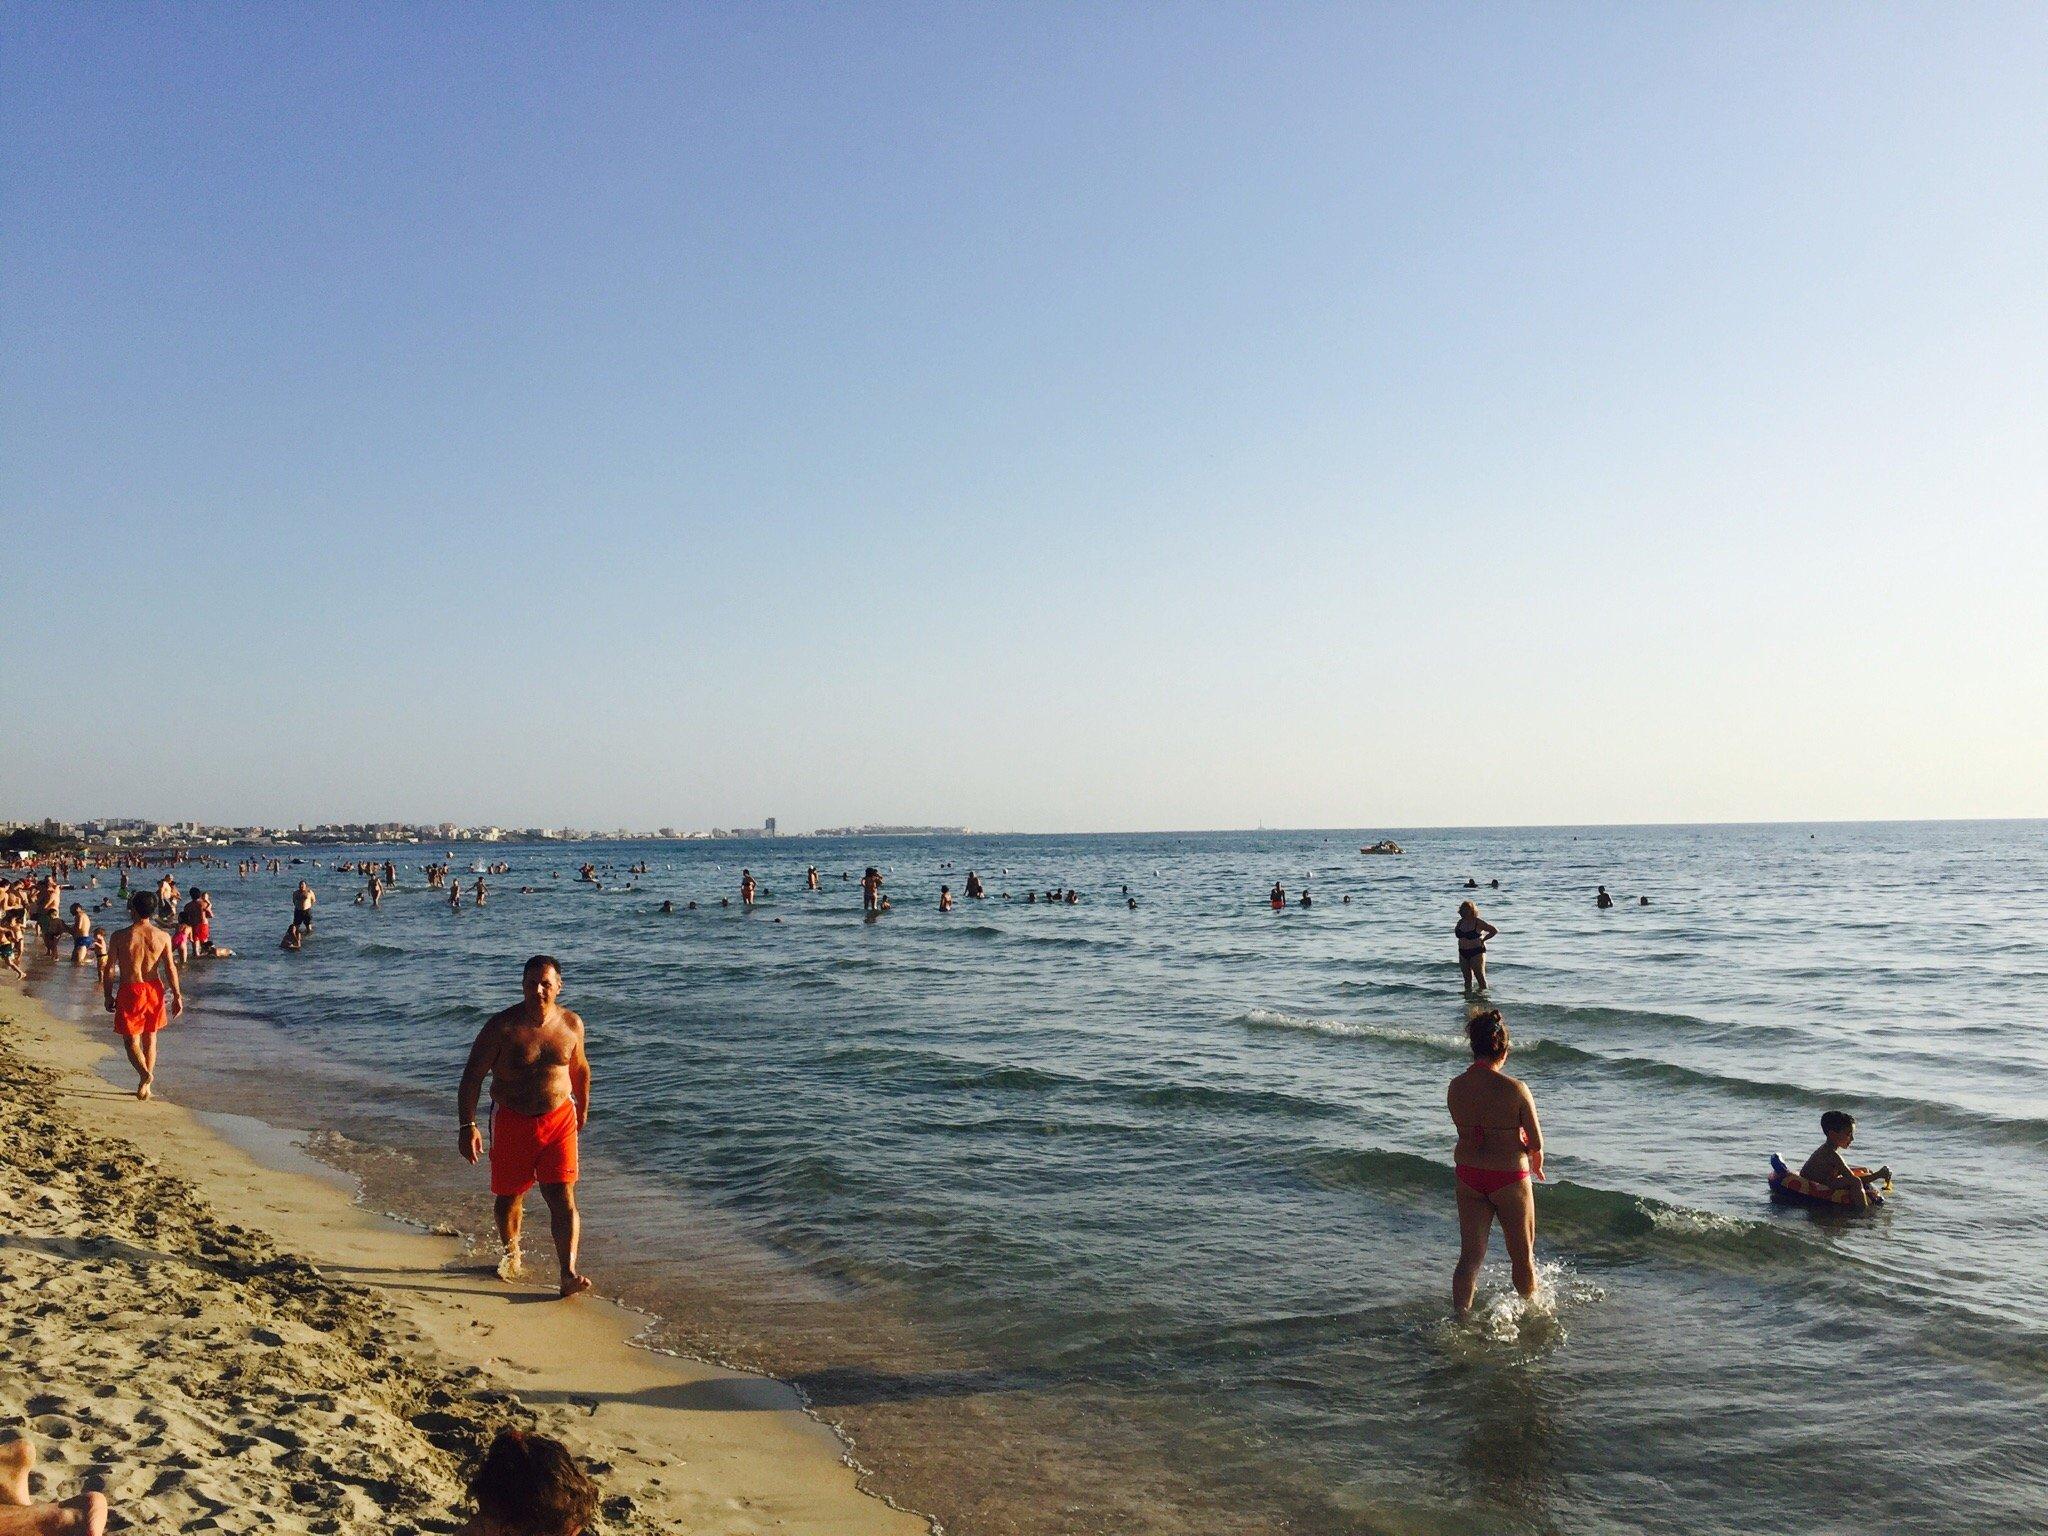 Lido Holiday Beach